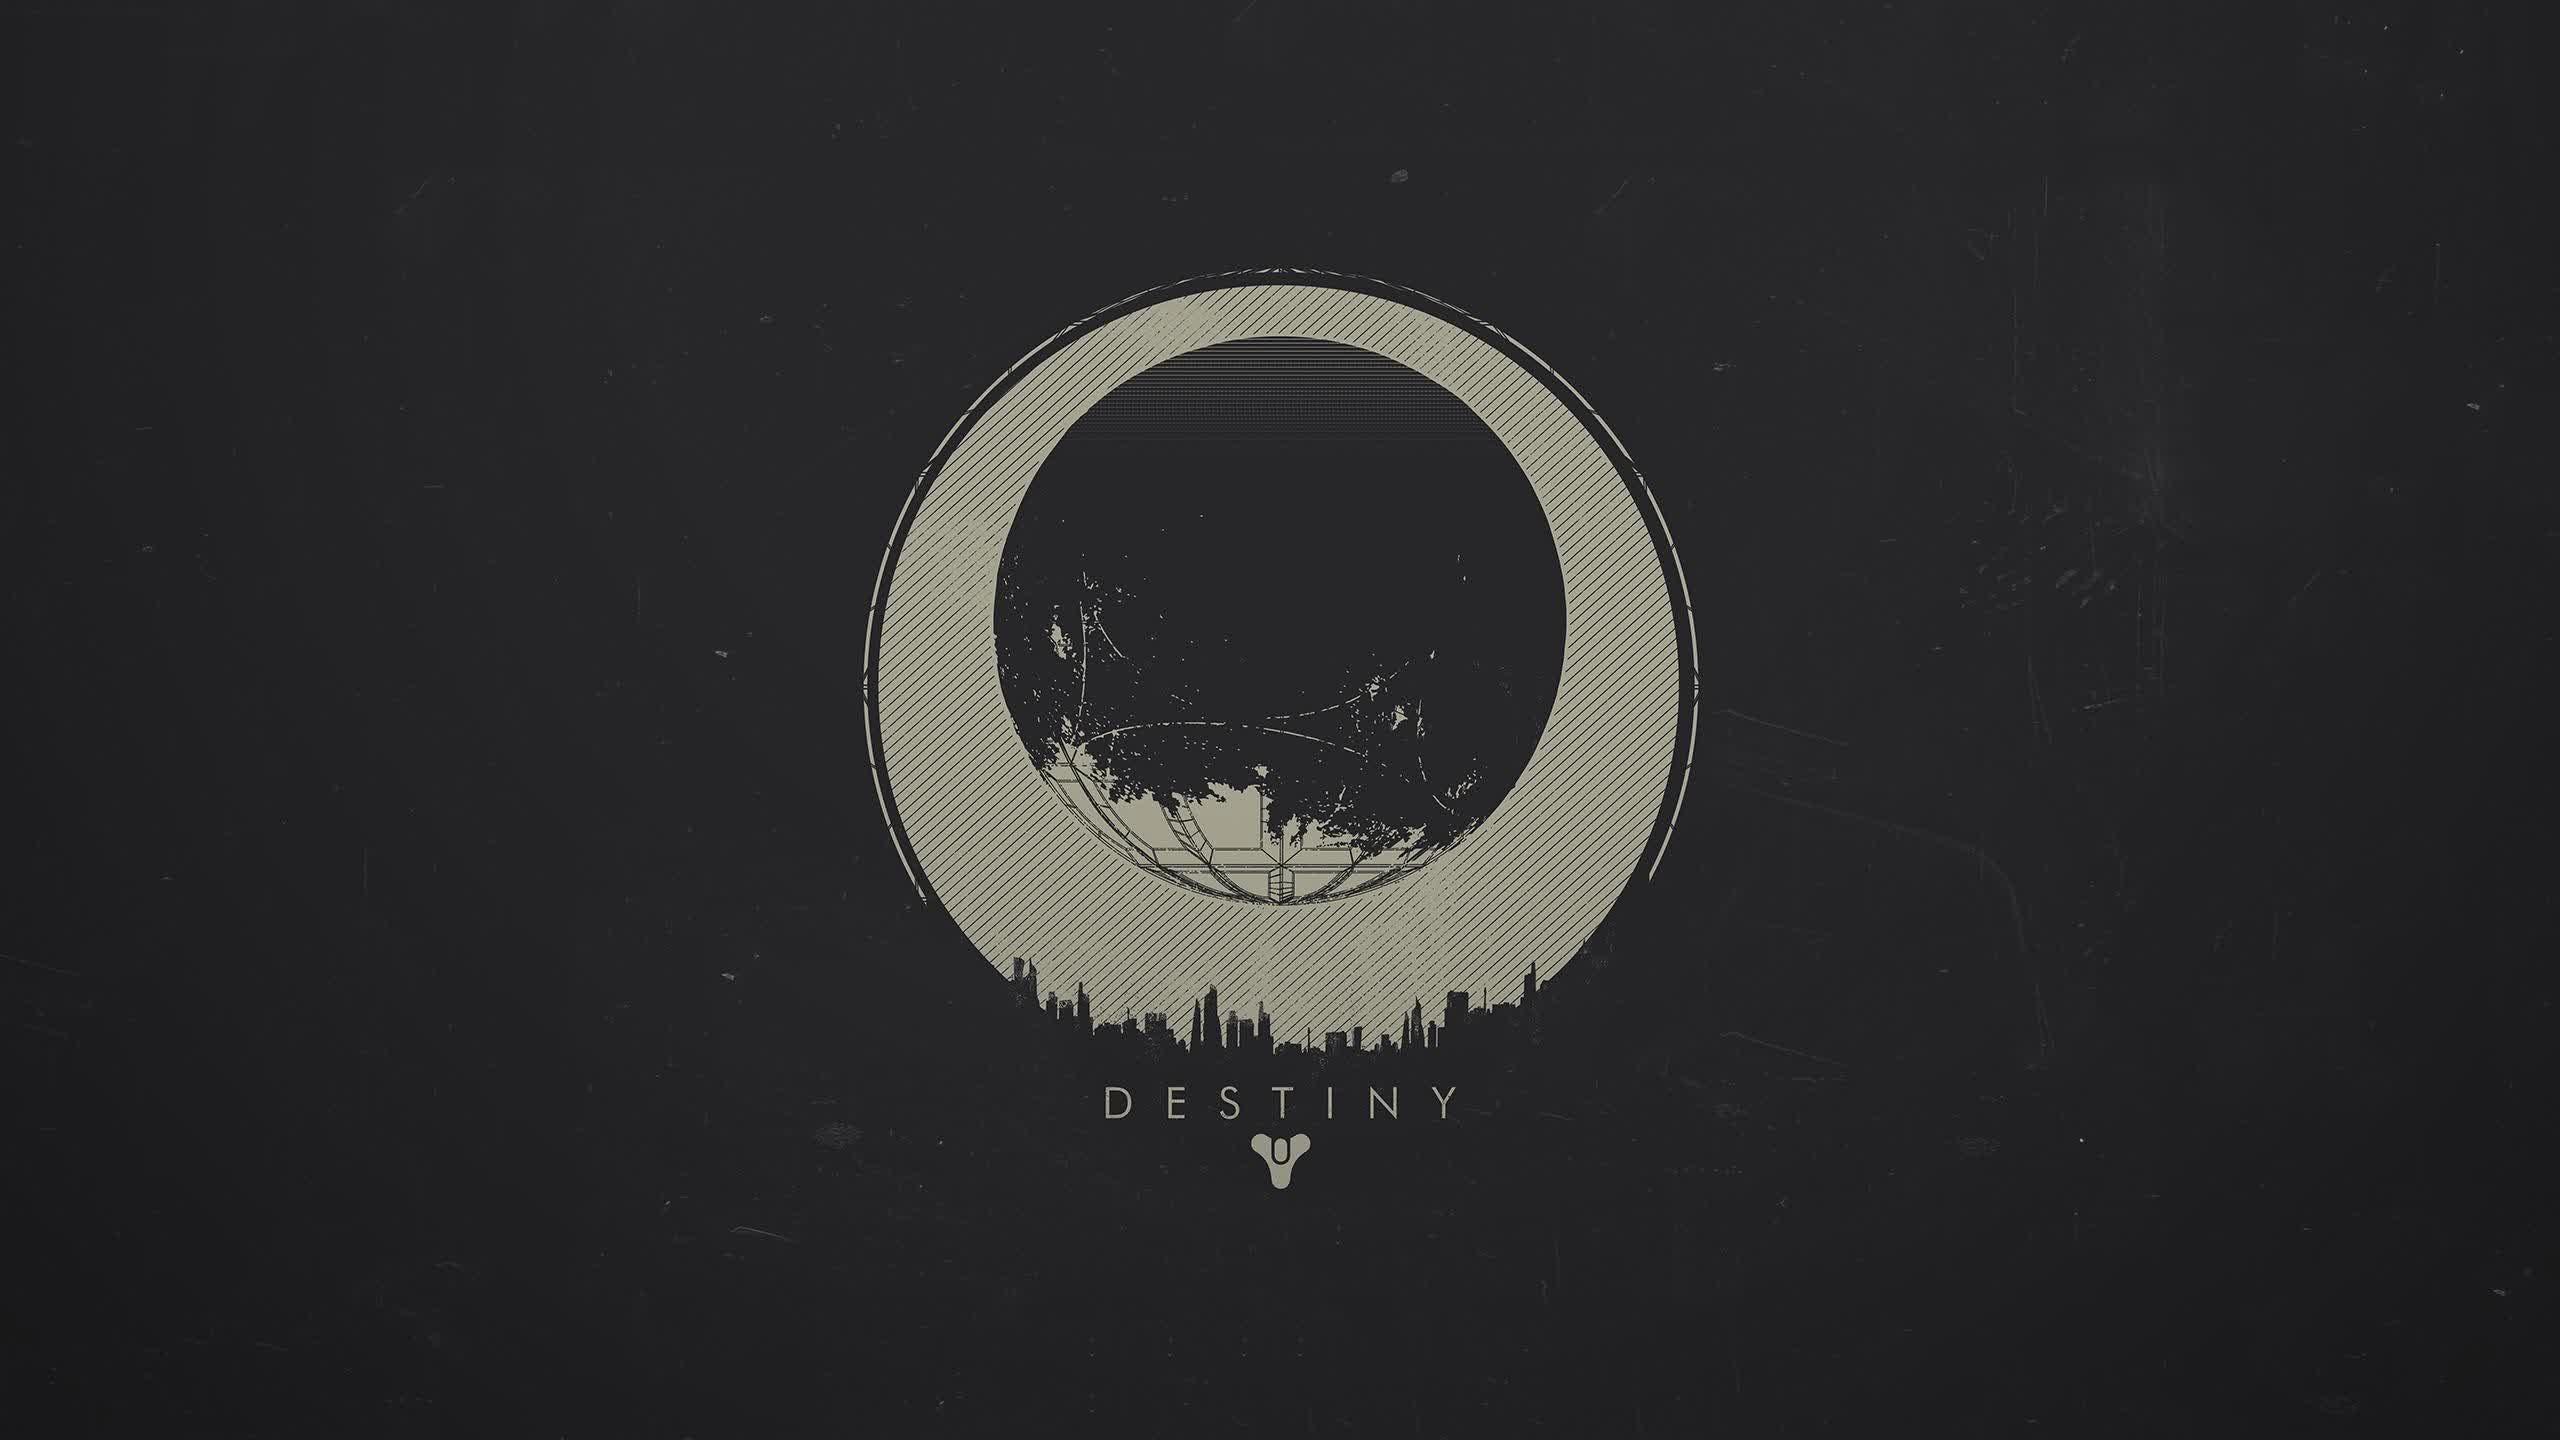 Best Dark moon over the dark city wallpaper Wallpapers 4k Ultra HD .